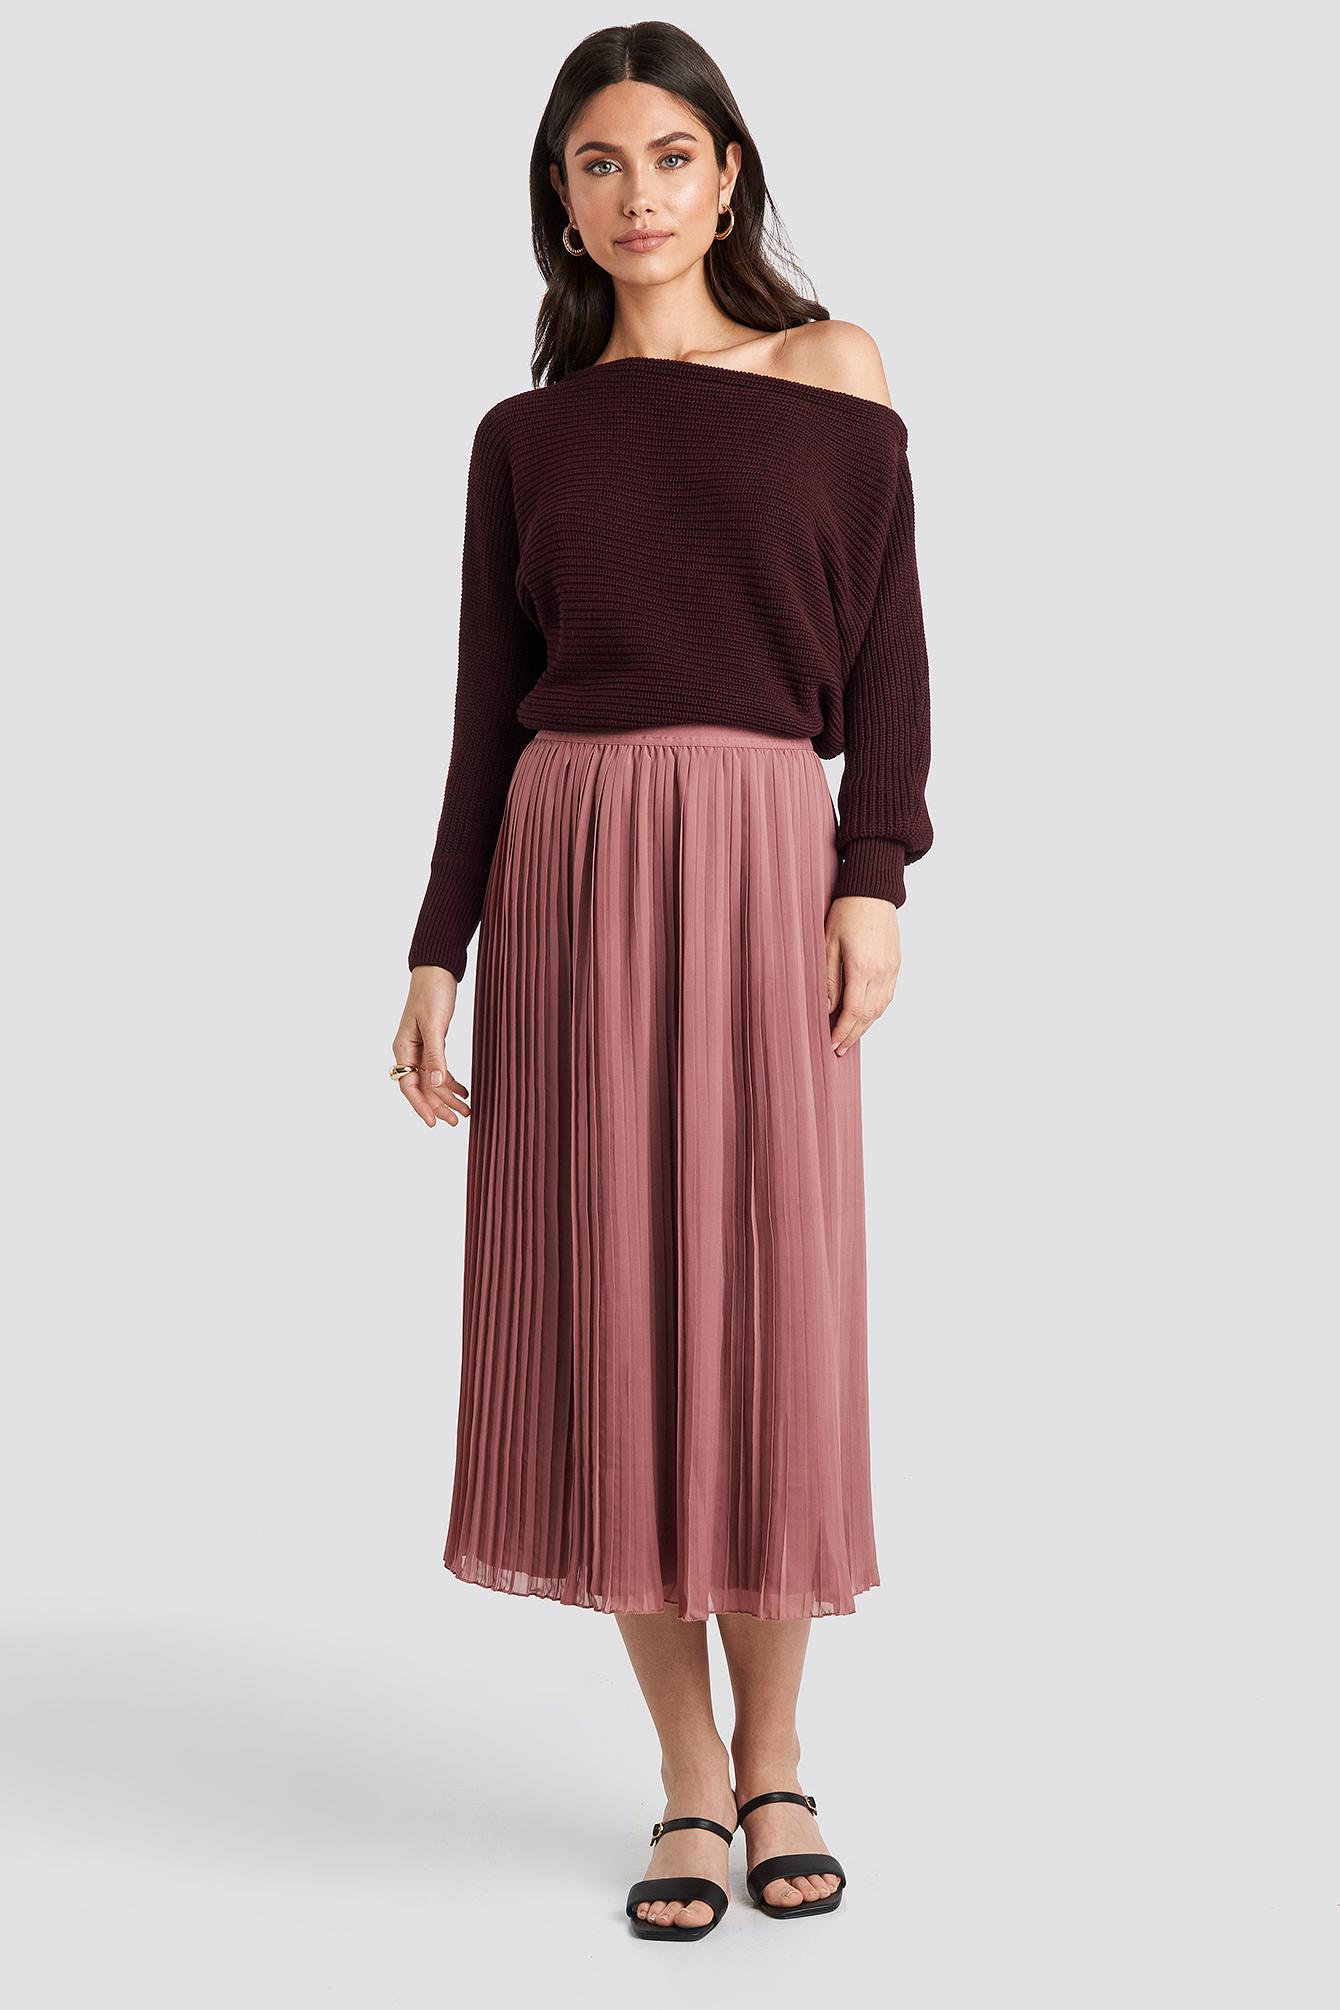 NA-KD Faltenrock - Pink   Bekleidung > Röcke > Faltenröcke   NA-KD